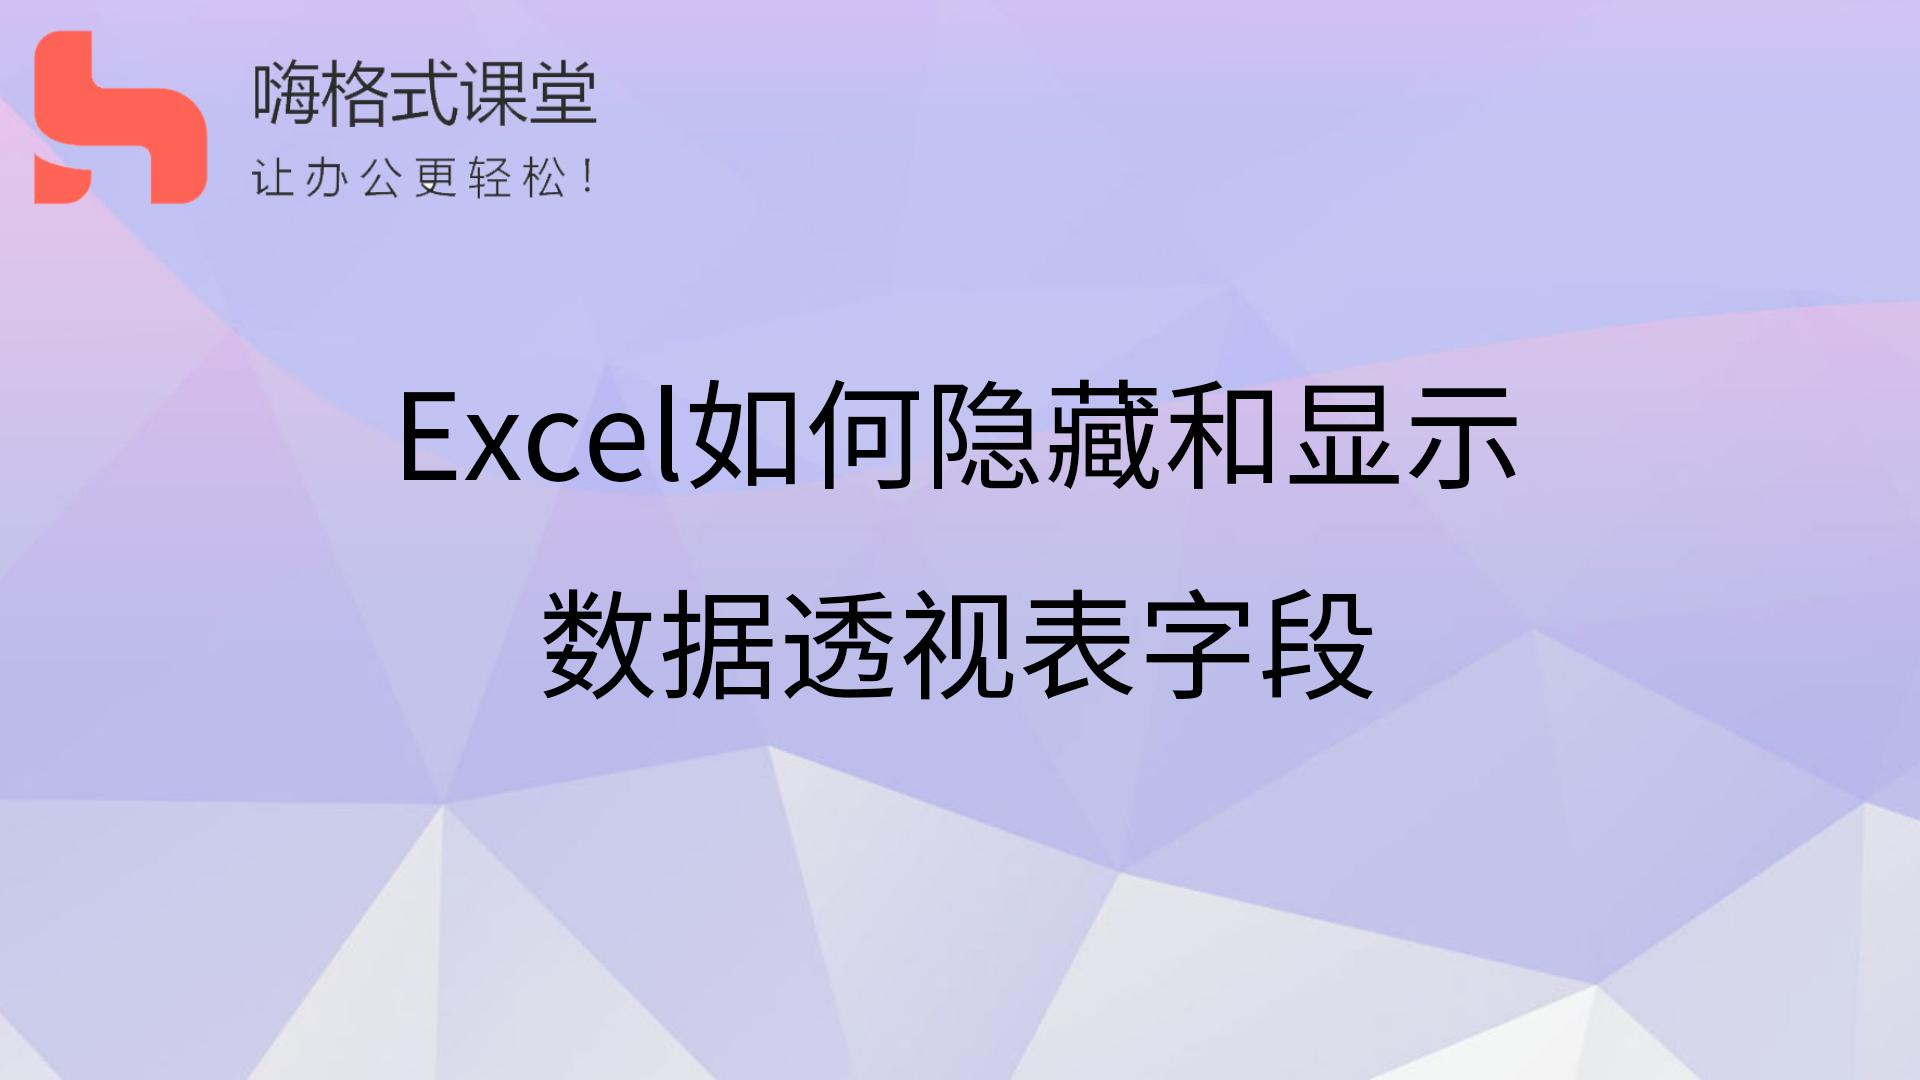 Excel如何隐藏和显示数据透视表字段